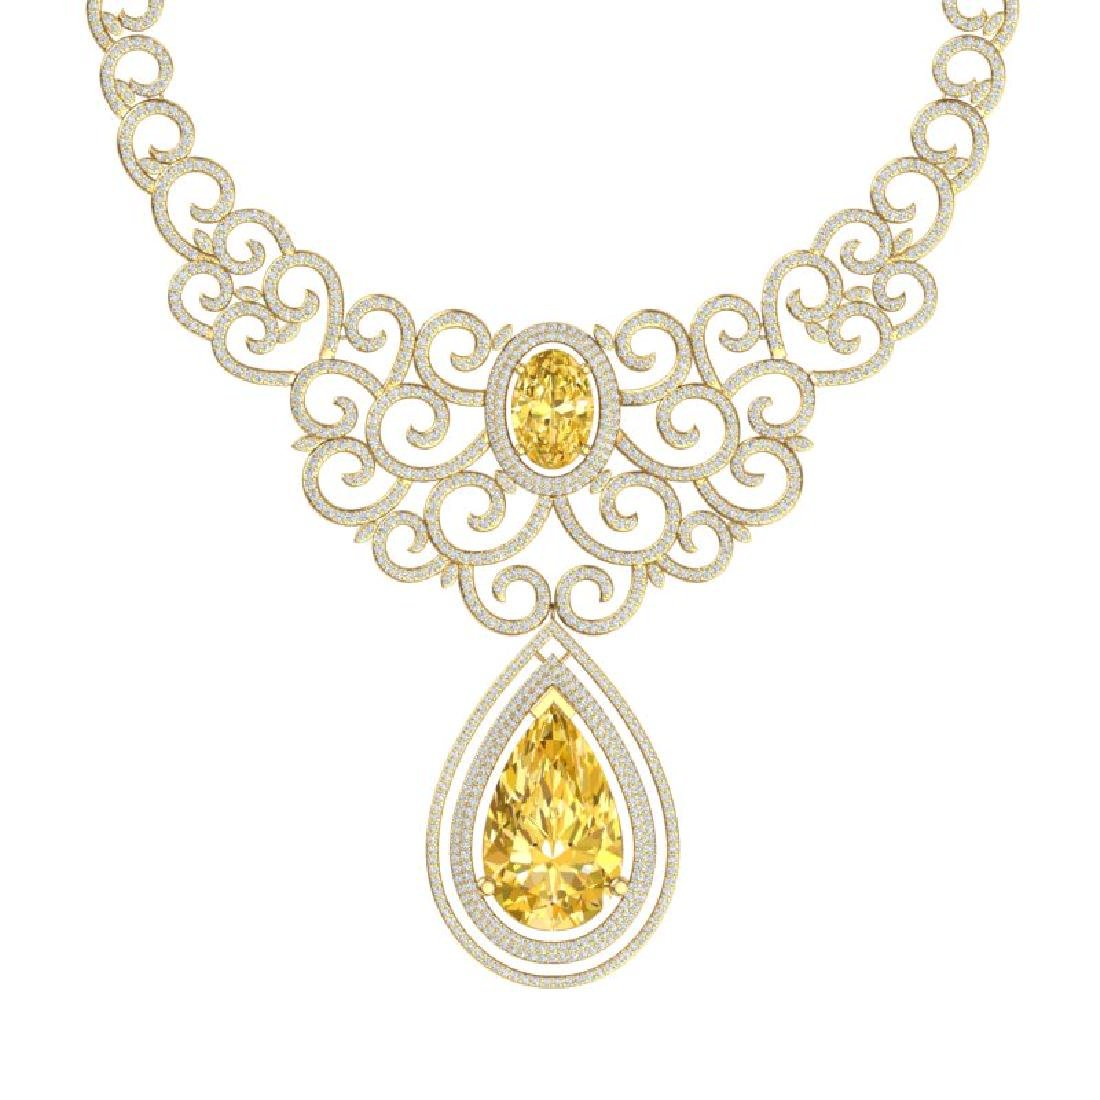 73.43 CTW Royalty Canary Citrine & VS Diamond Necklace - 2